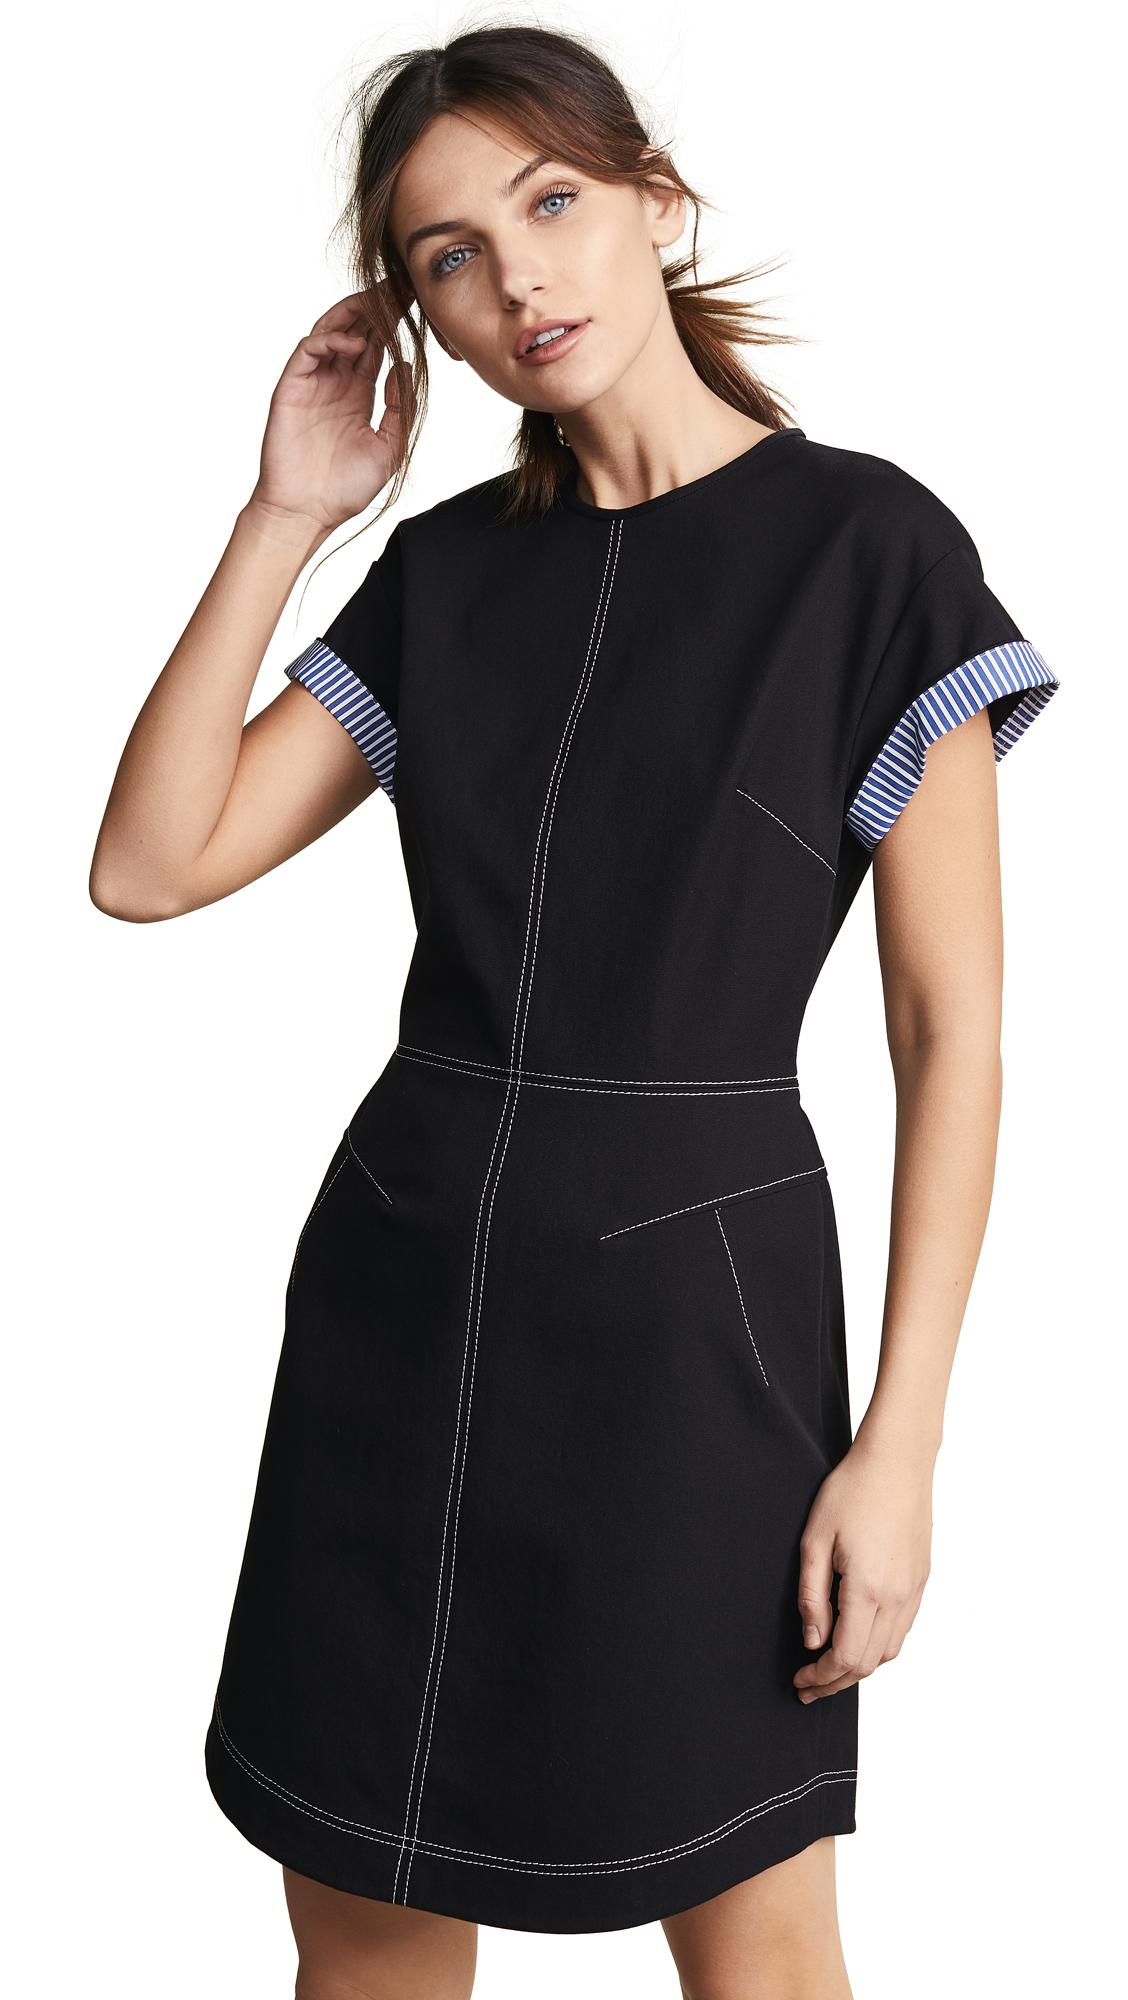 Derek Lam 10 Crosby Short Sleeve Crew Neck Dress - Black